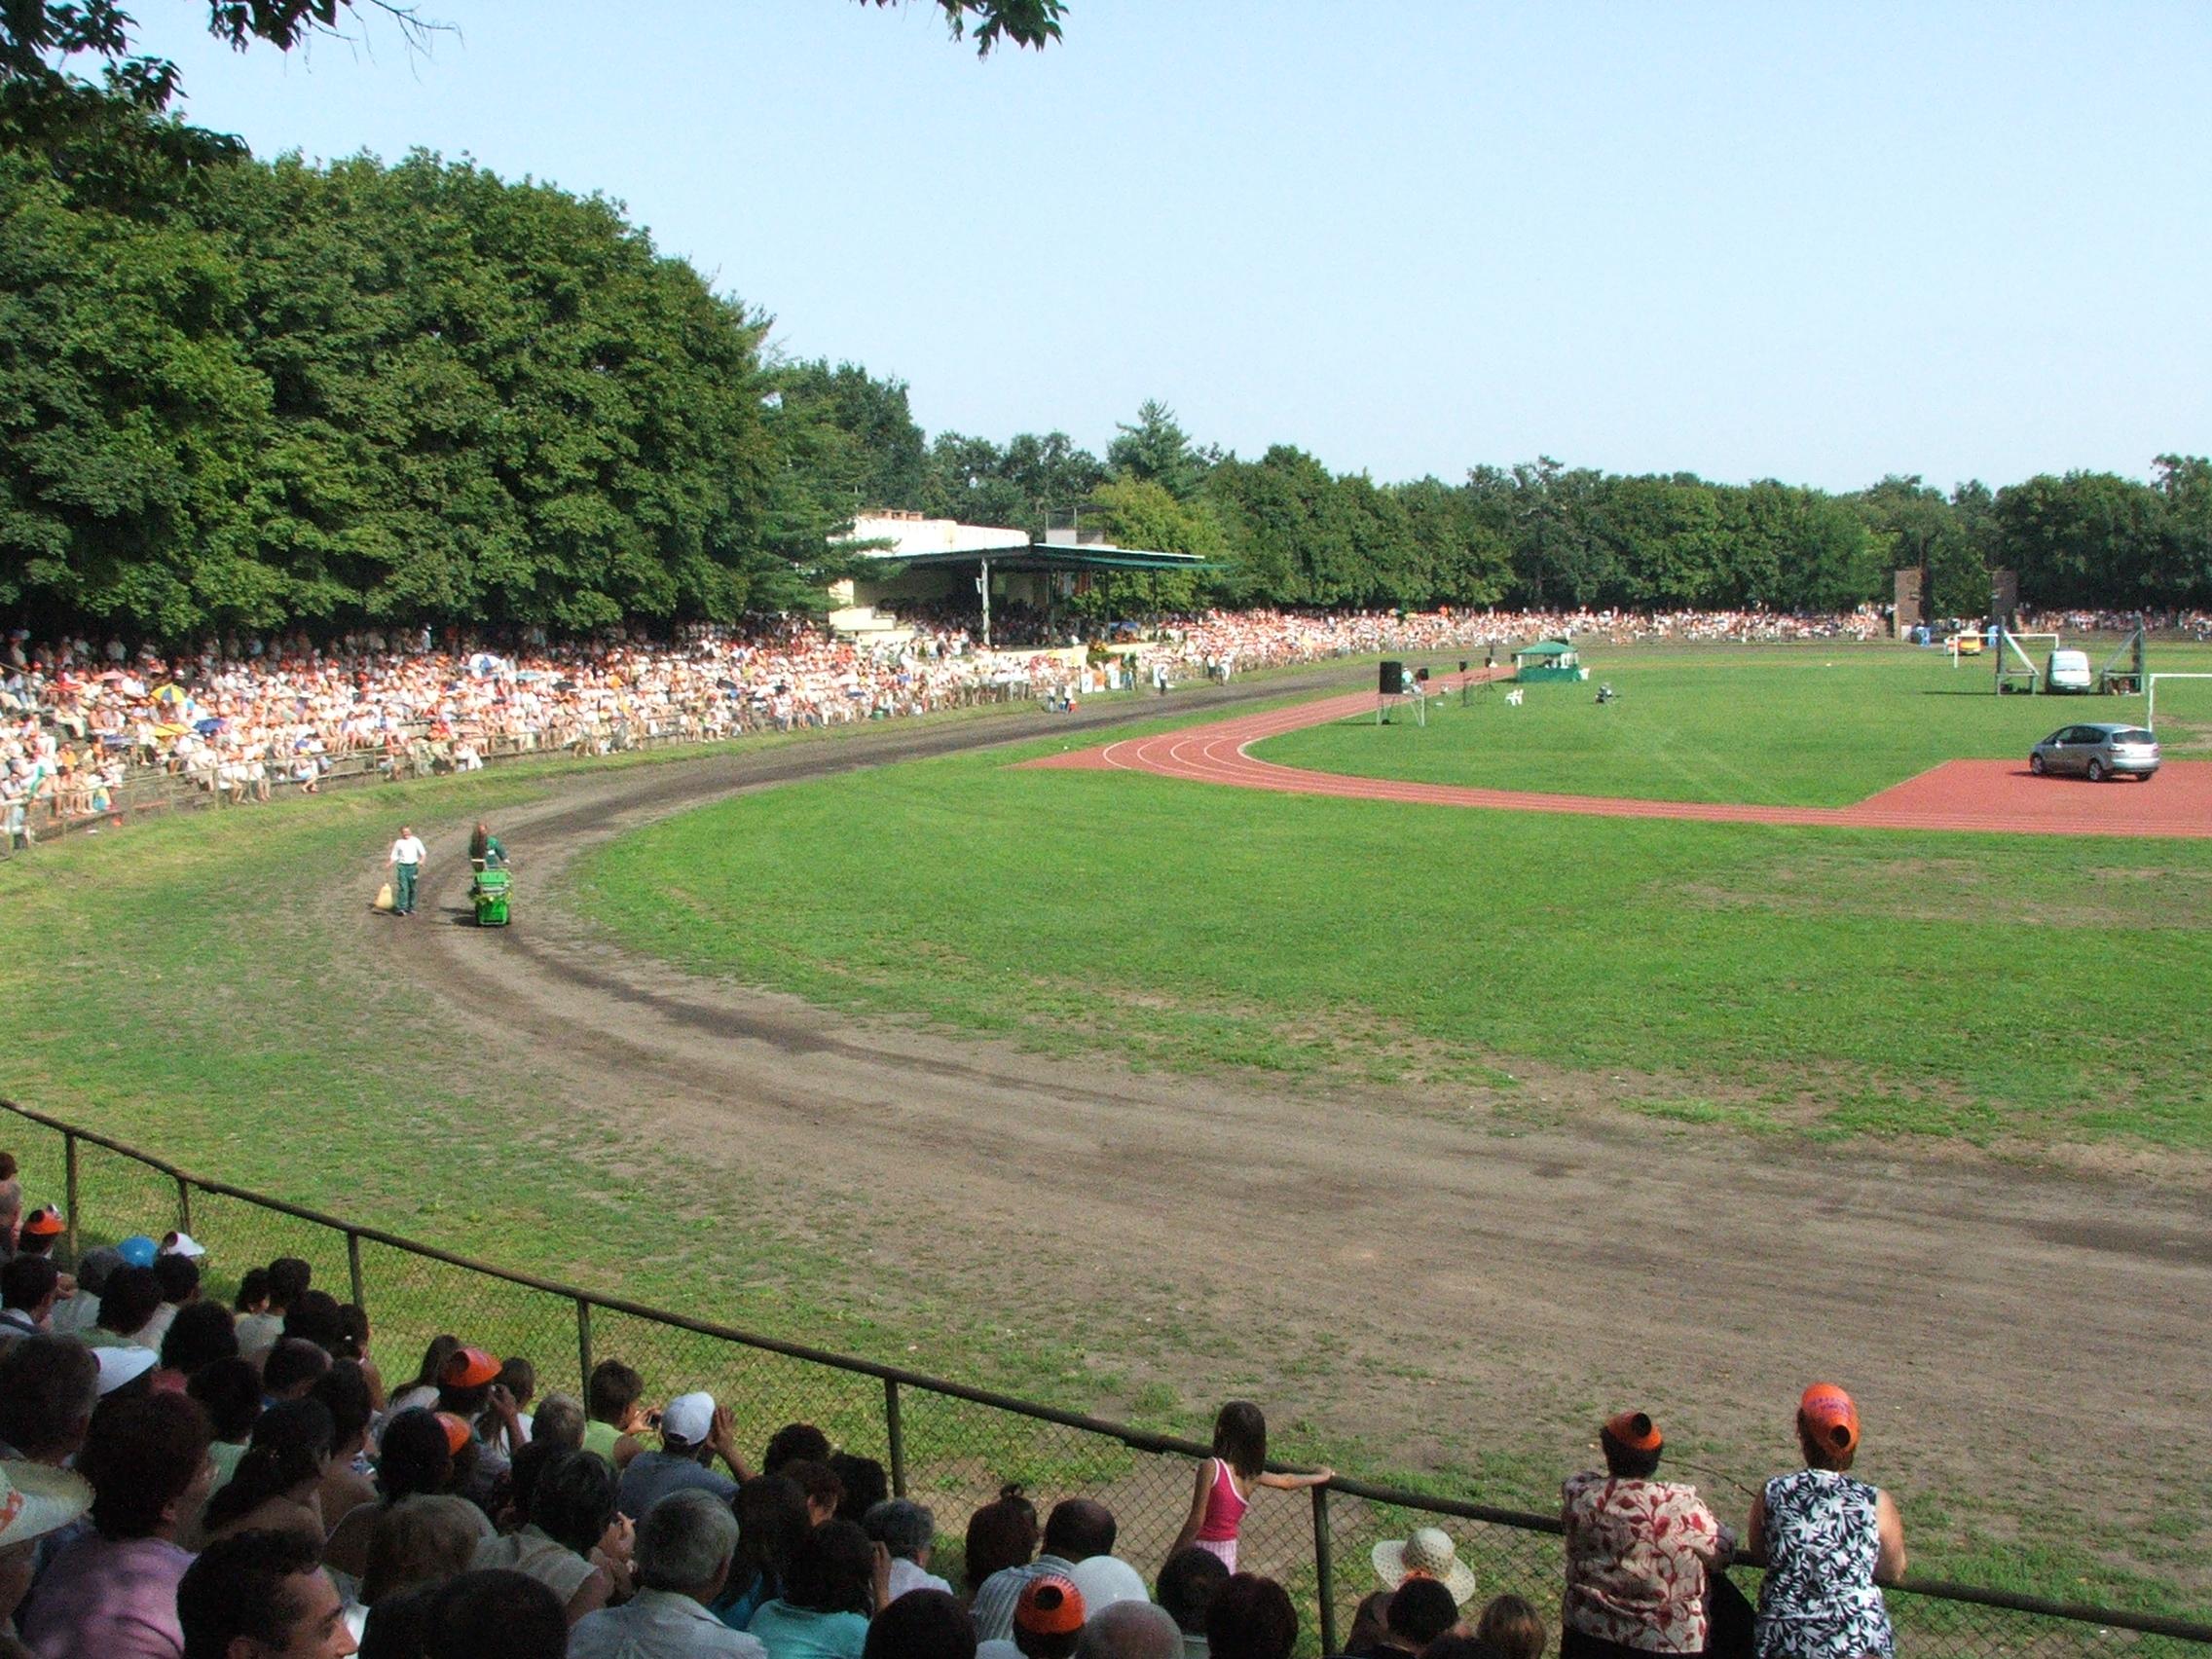 File Debrecen Nagyerdei stadion 2006-08-20.jpg - Wikimedia Commons fe79d5ab09